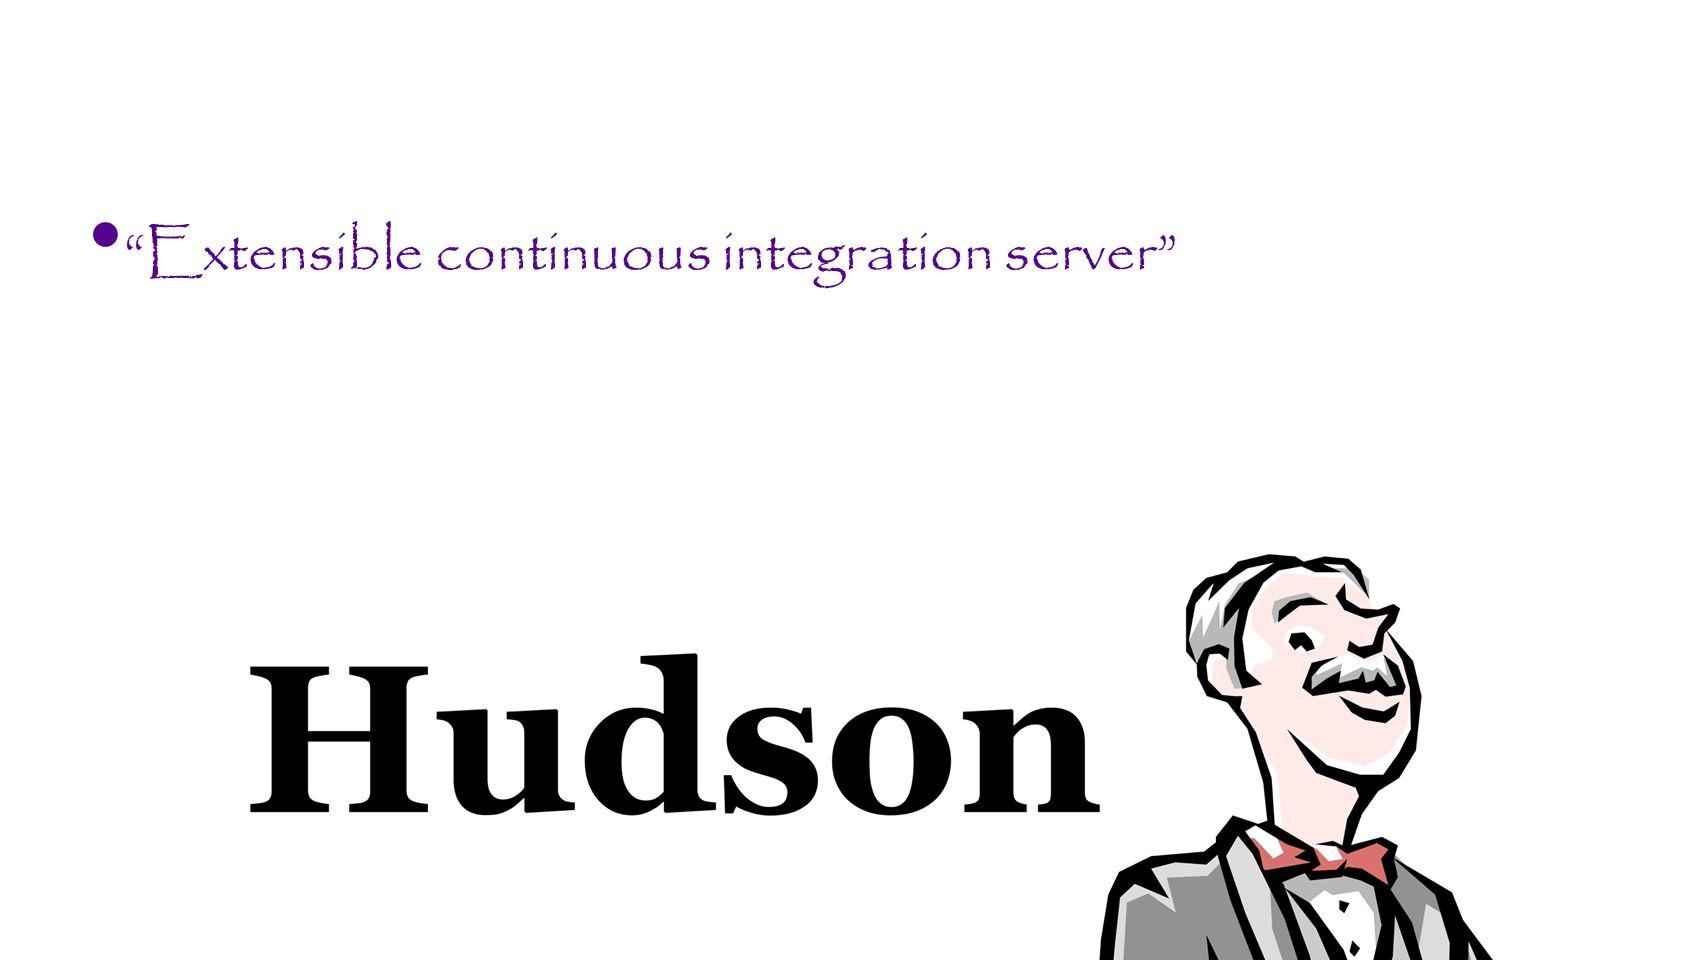 Extensible continuous integration server